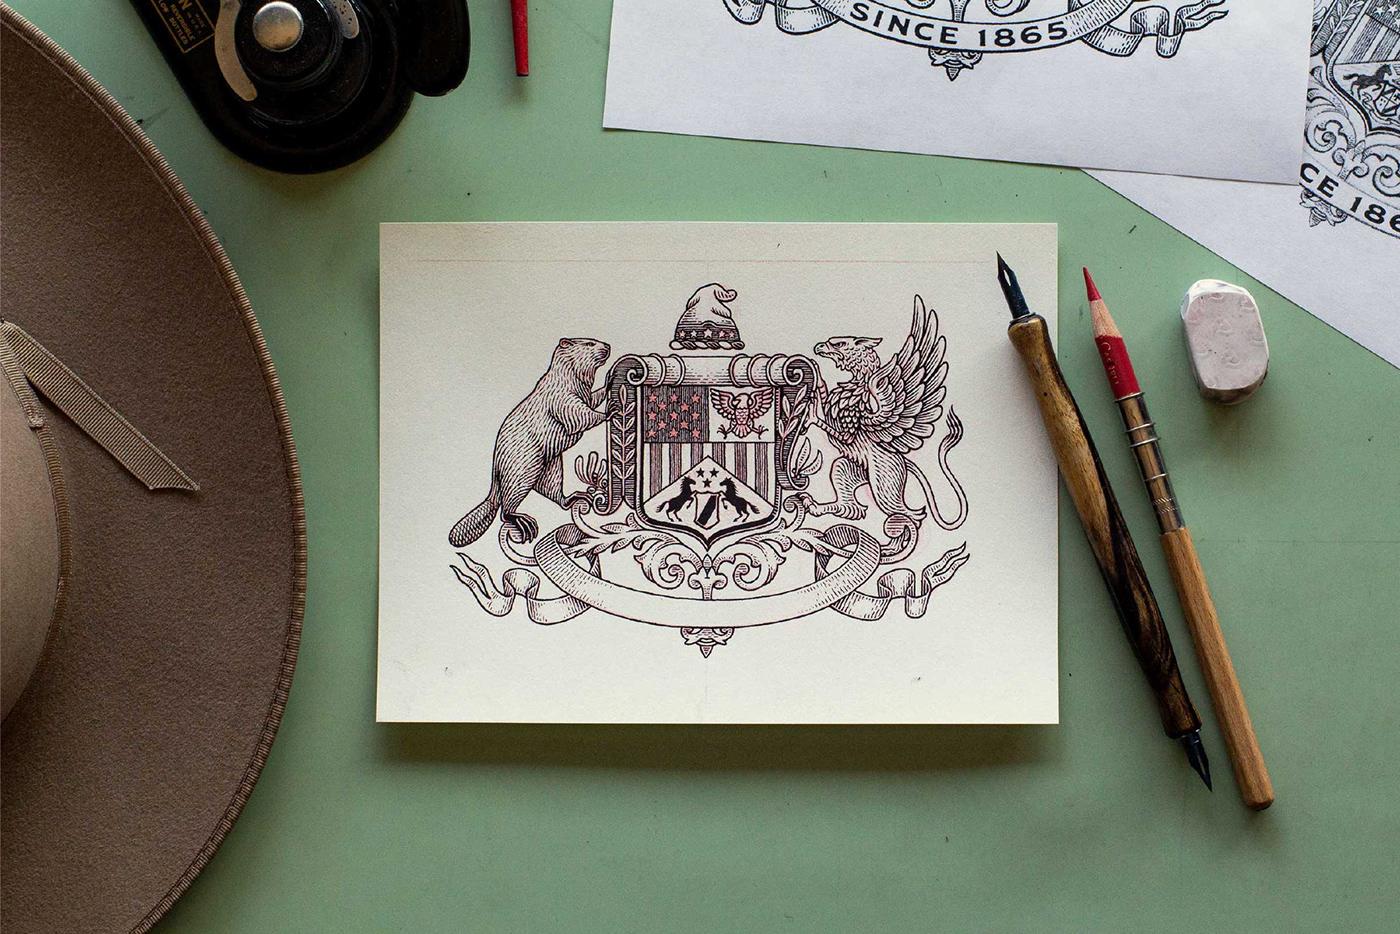 cowboy hat historic ILLUSTRATION  mark stetson Tractorbeam western crest ink pen